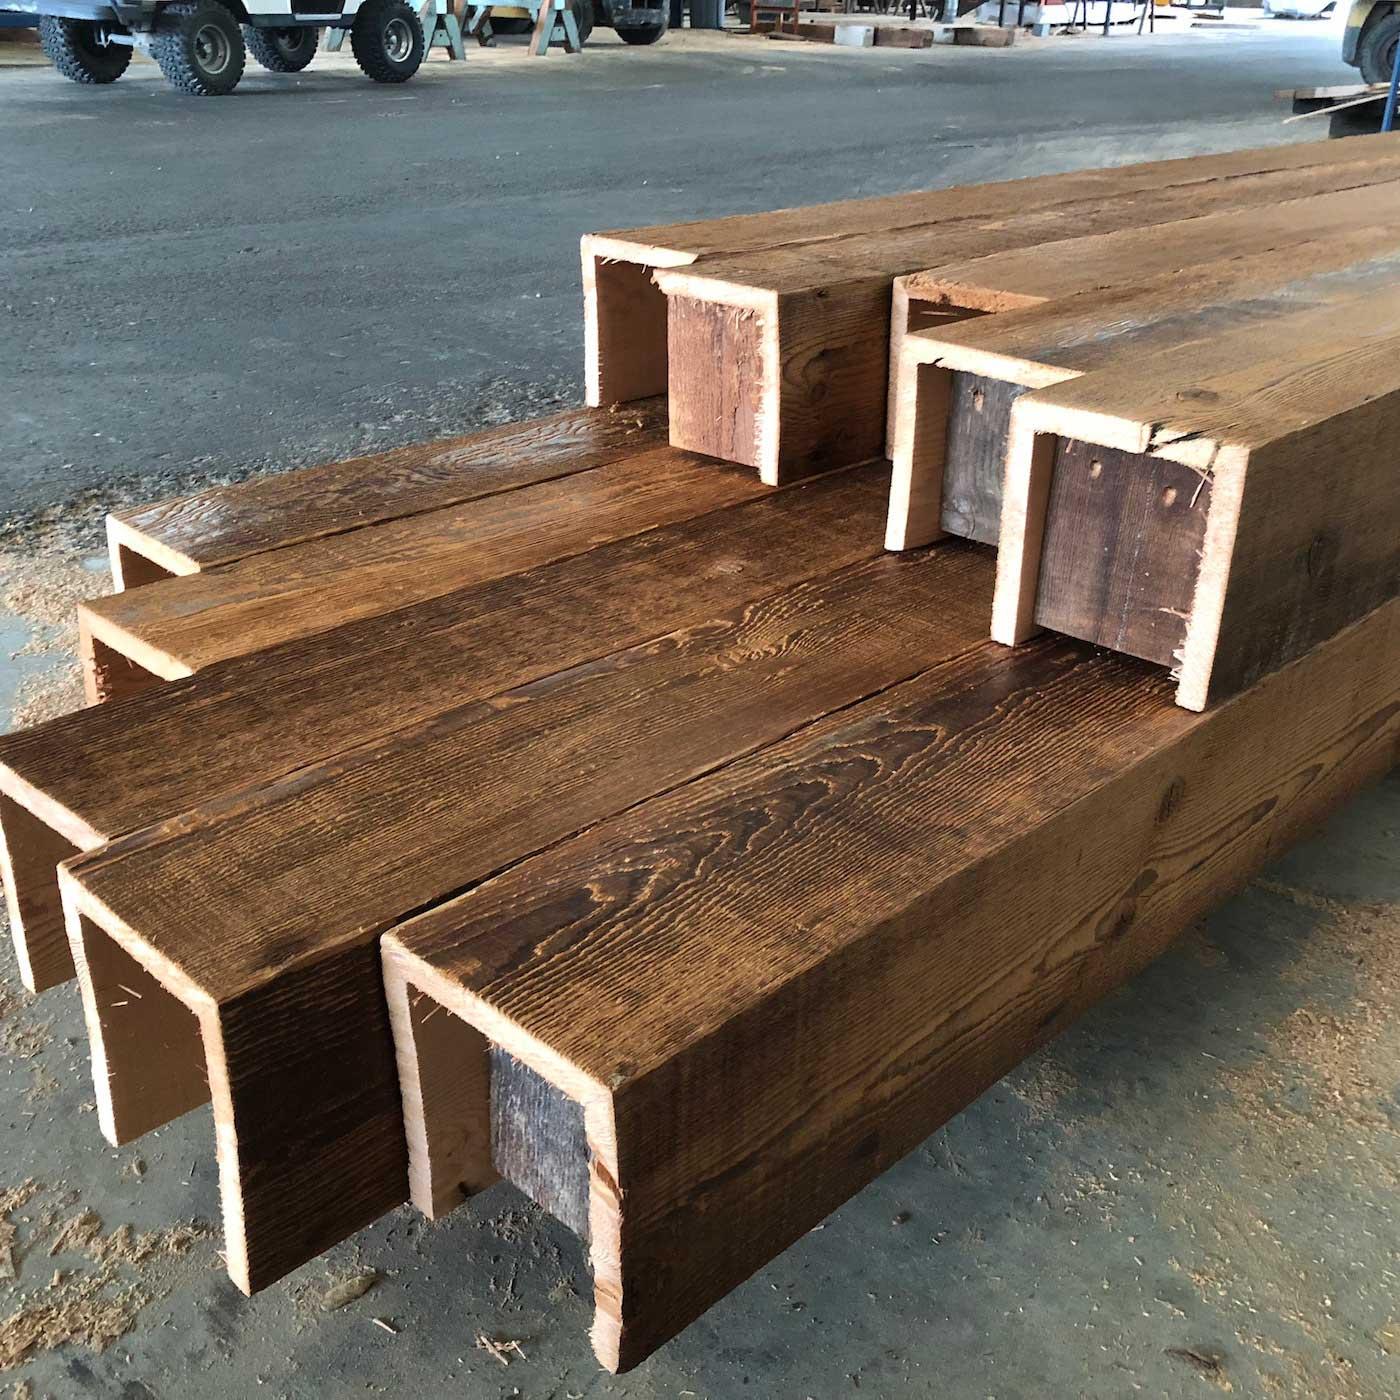 Sanded Douglas Fir Box Beams 1 - Box Beam Fabrication